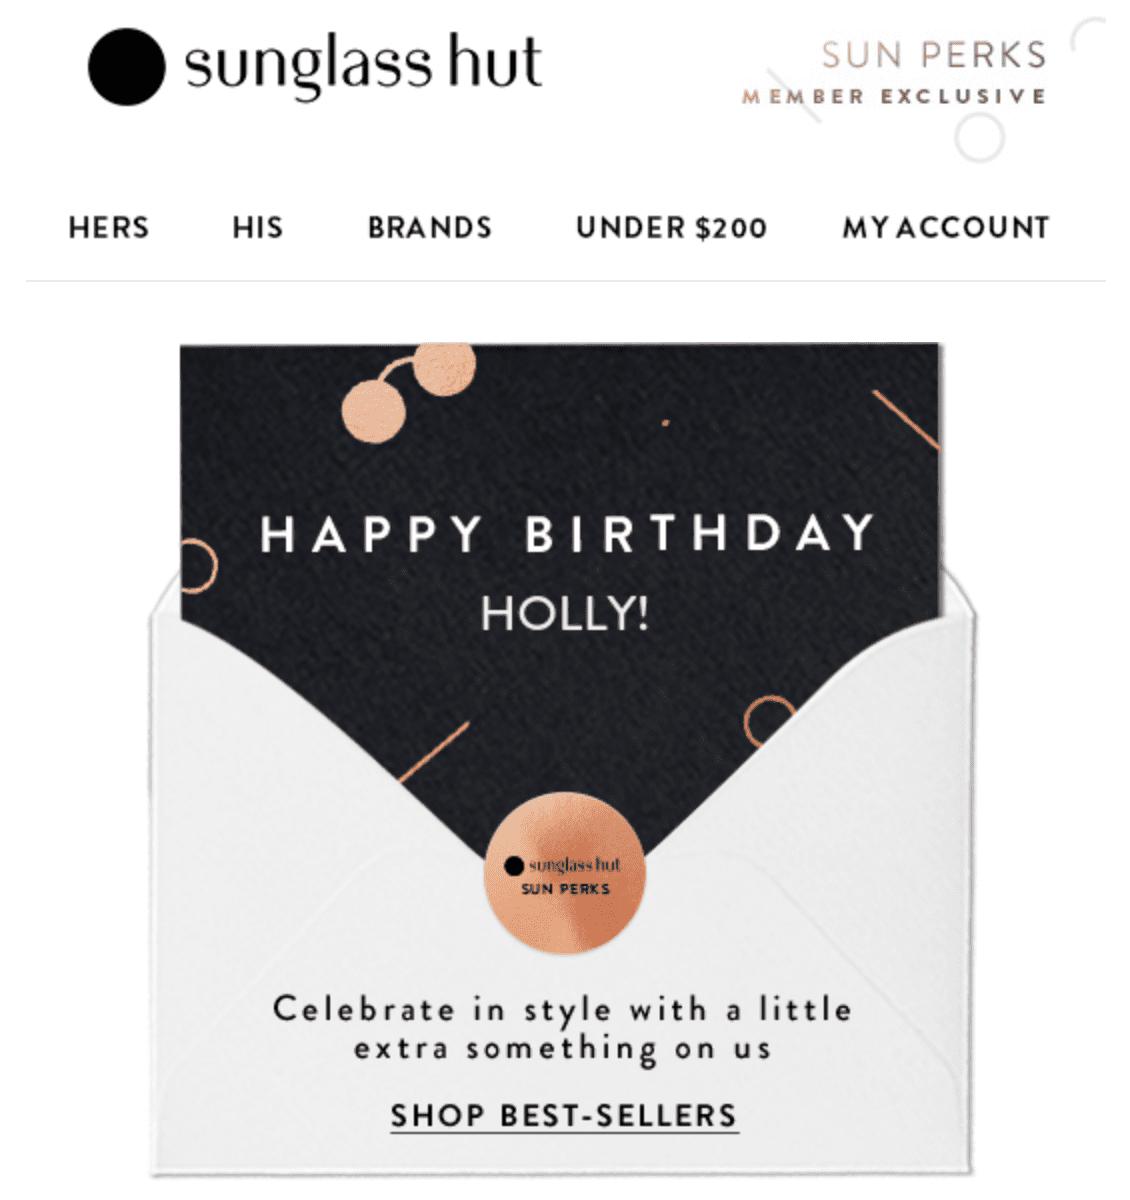 Sunglass-Hut-Email